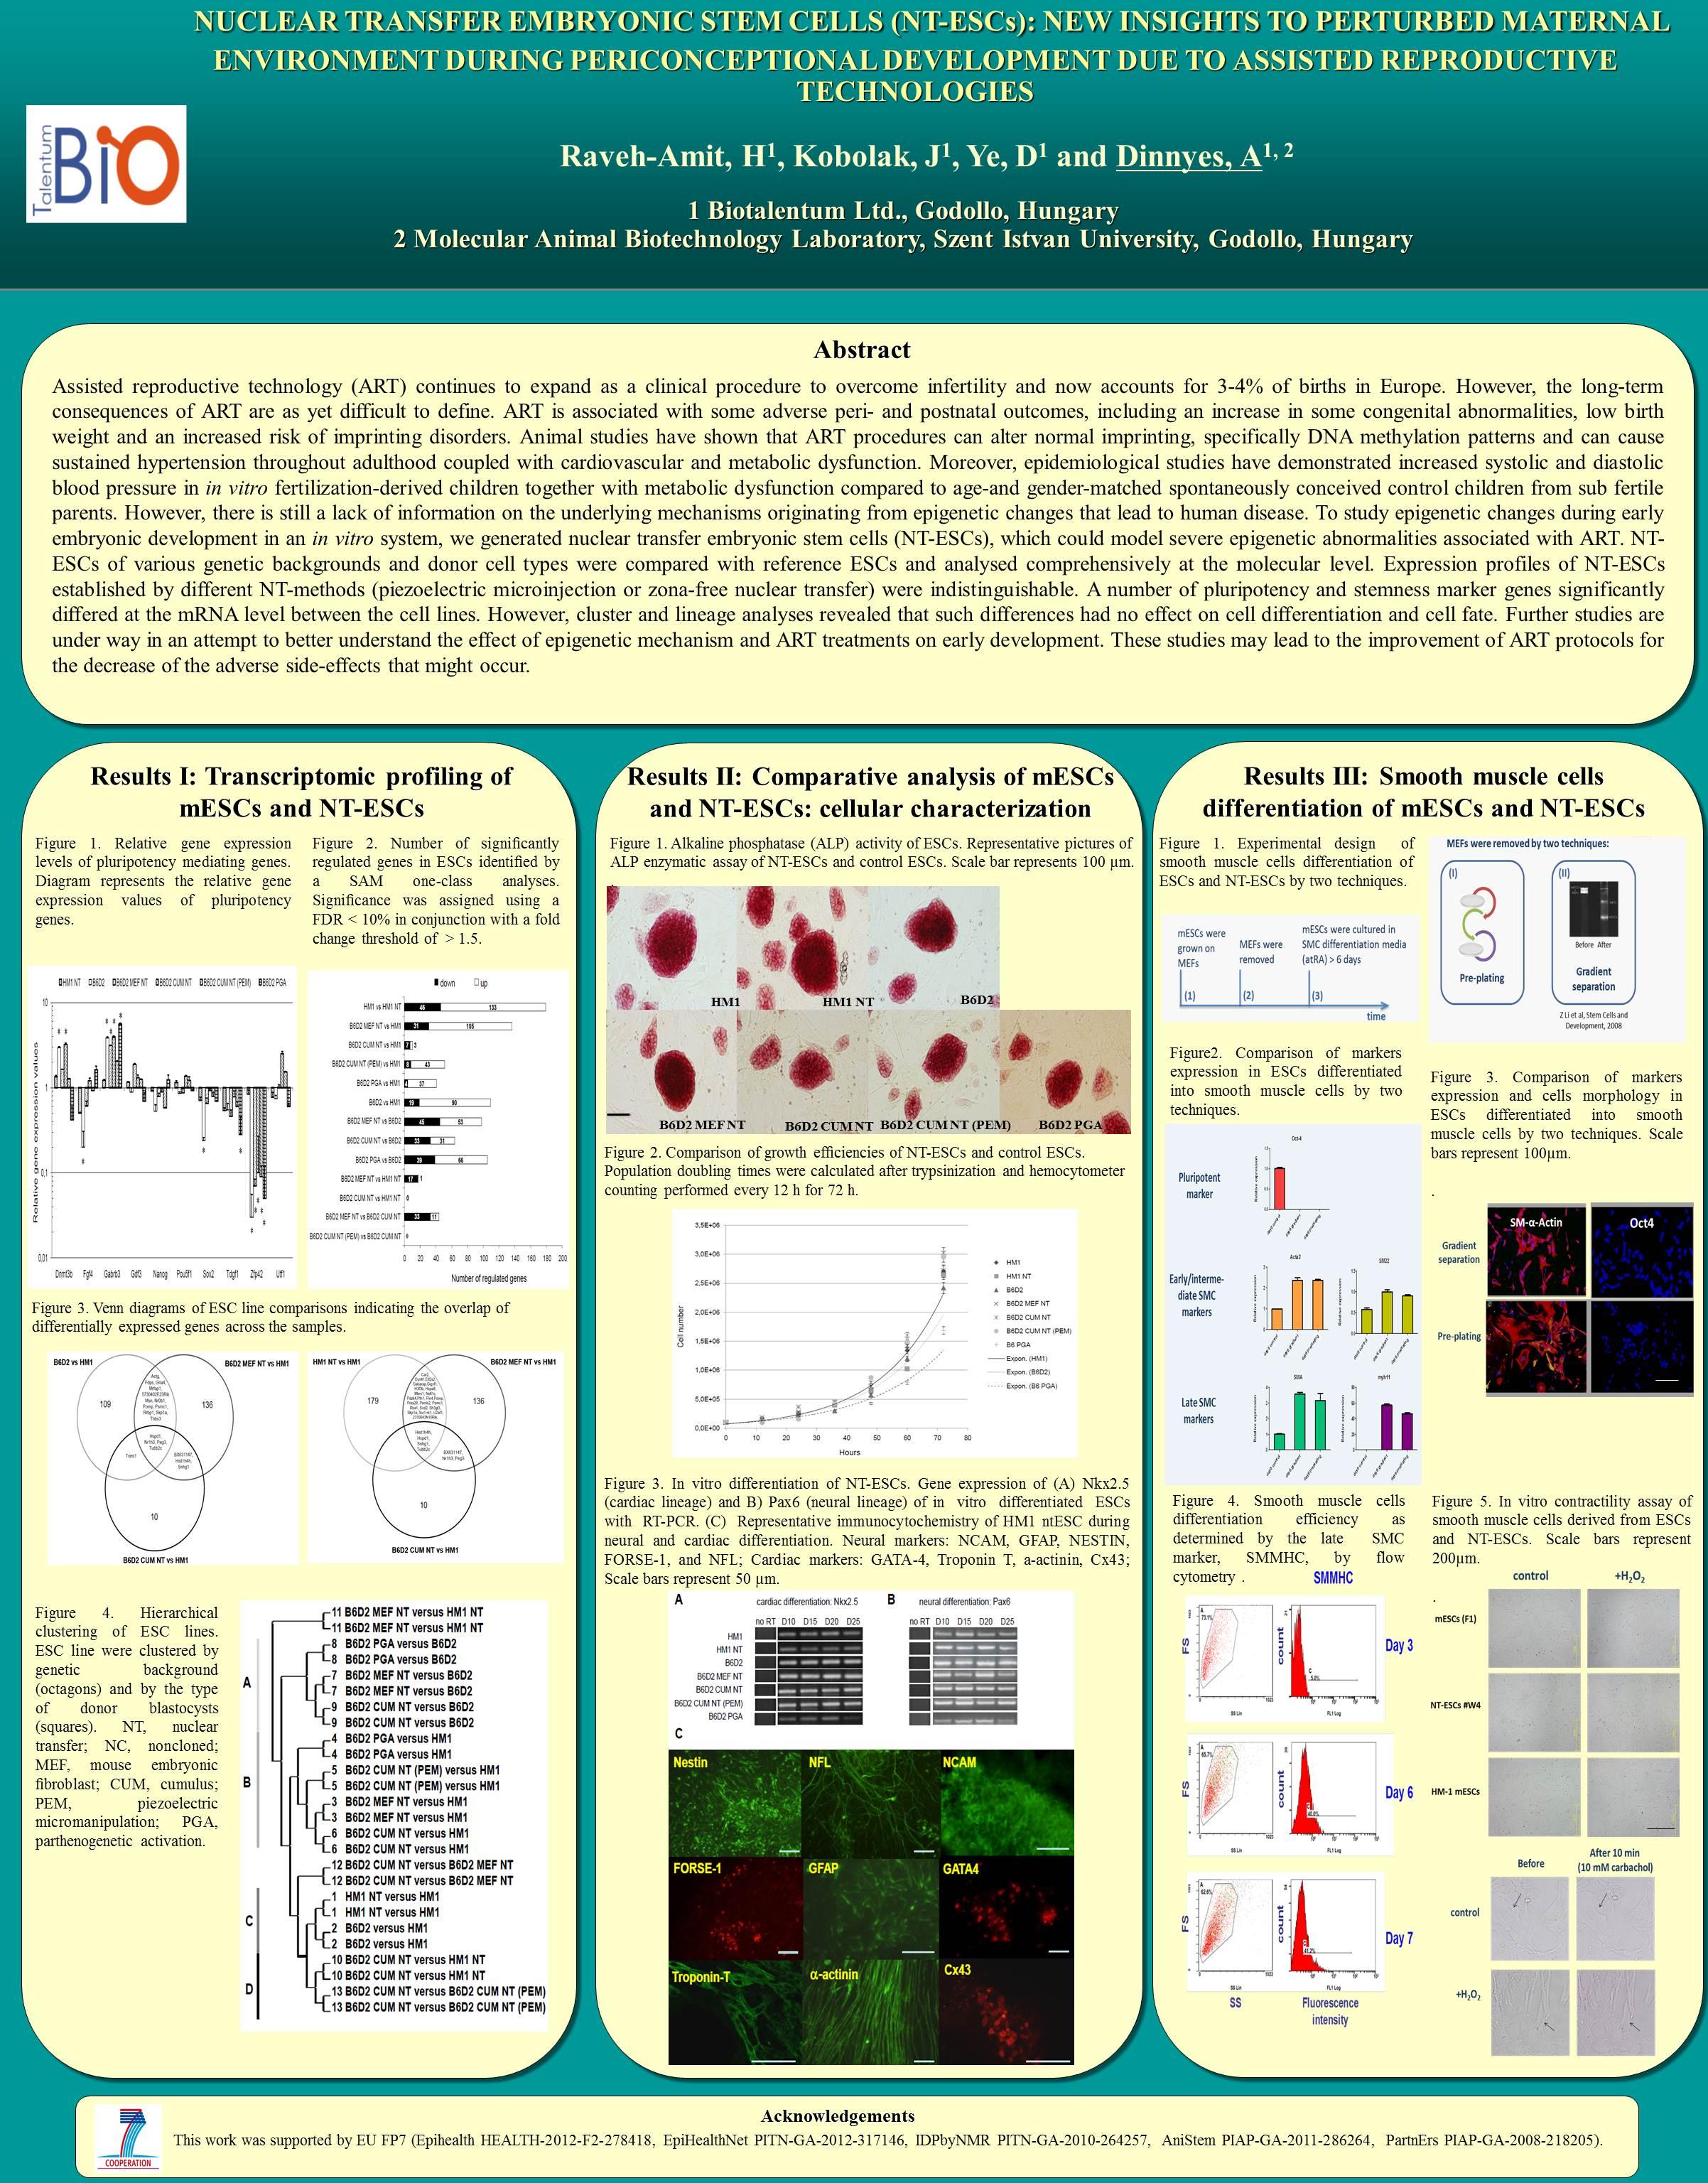 Templates for scientific posters portrait